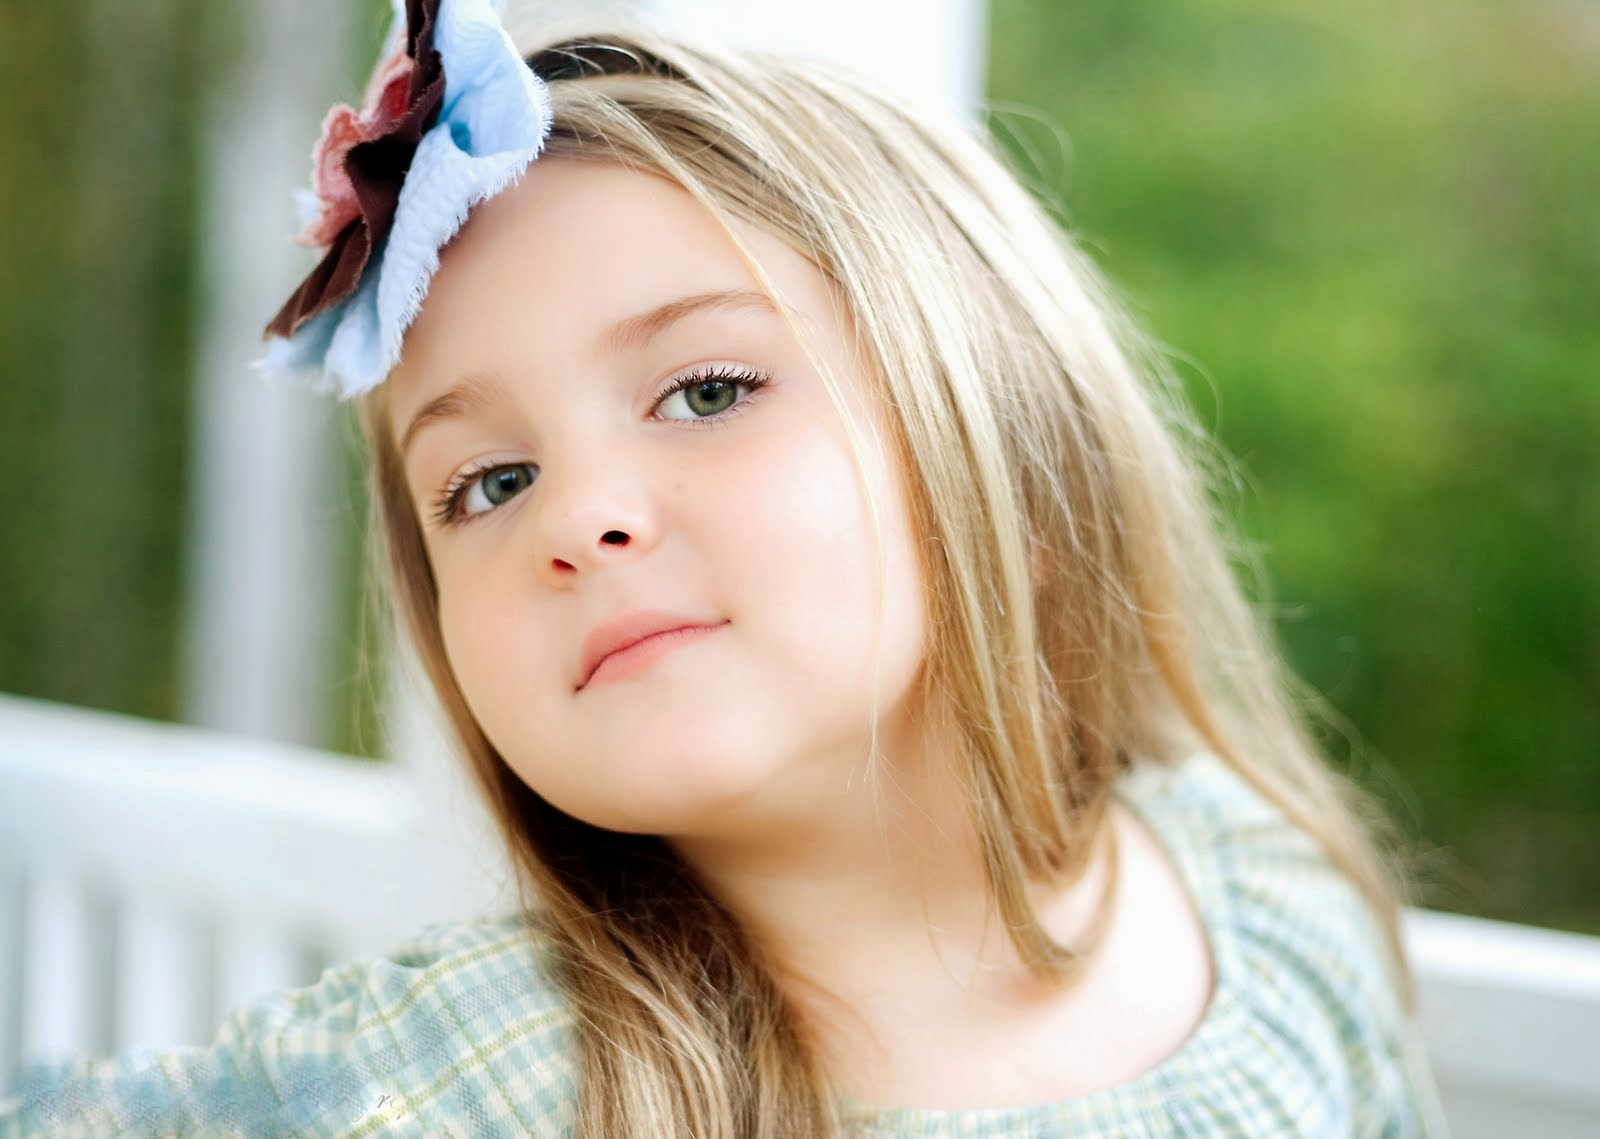 cute baby girl pic 2014